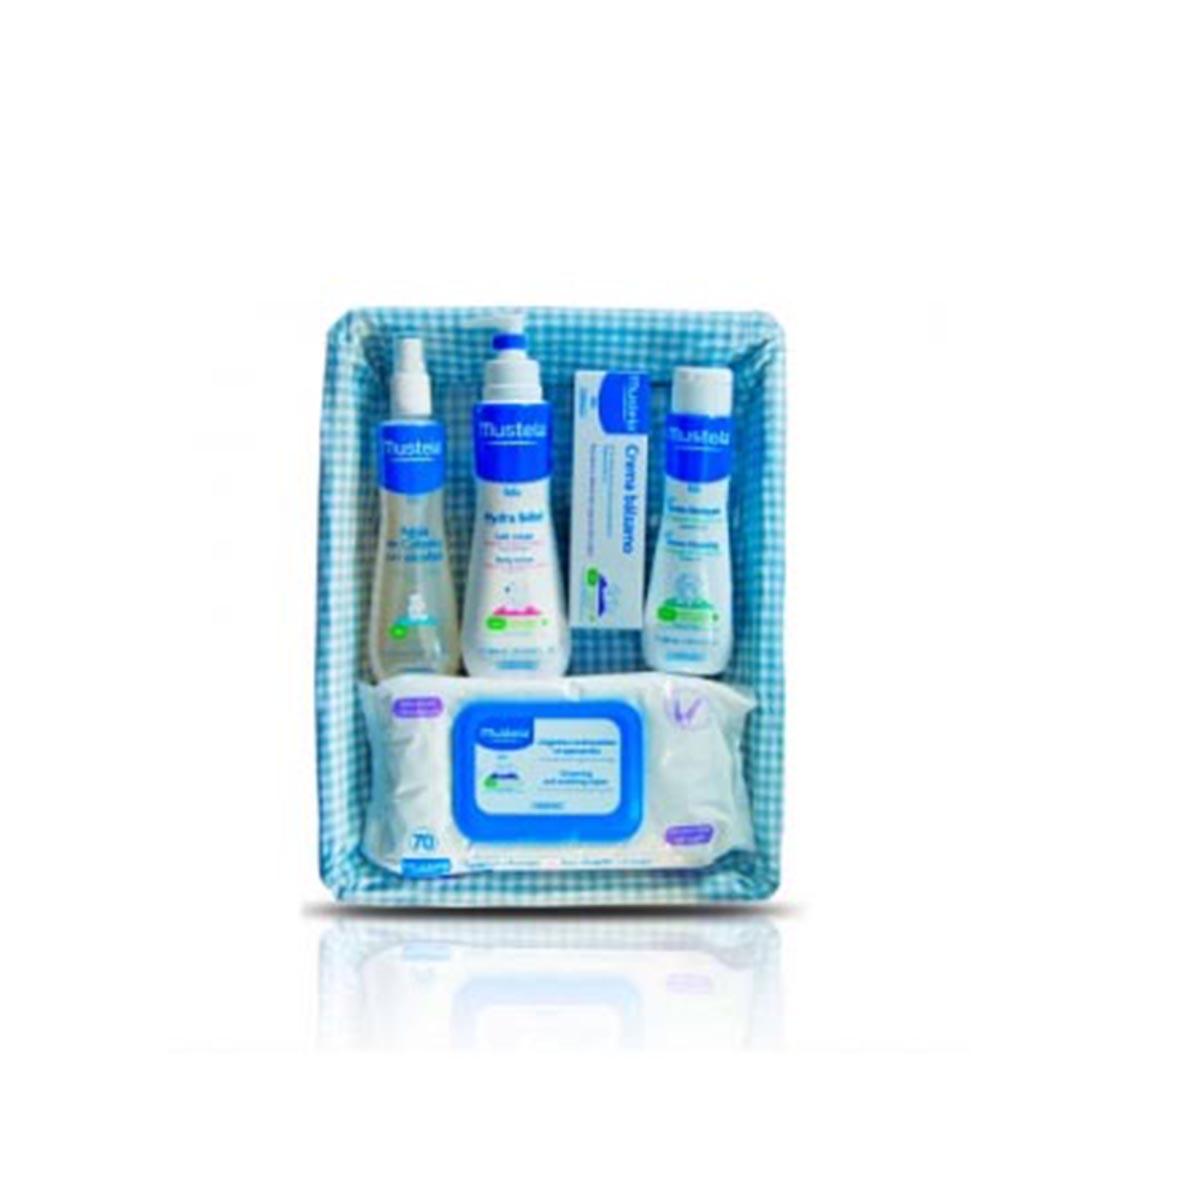 Mustela canastilla azul crema blsamo 50ml colonia s alcohol 200ml hydra bebe 300ml nettoyante 200ml toallitas 70u